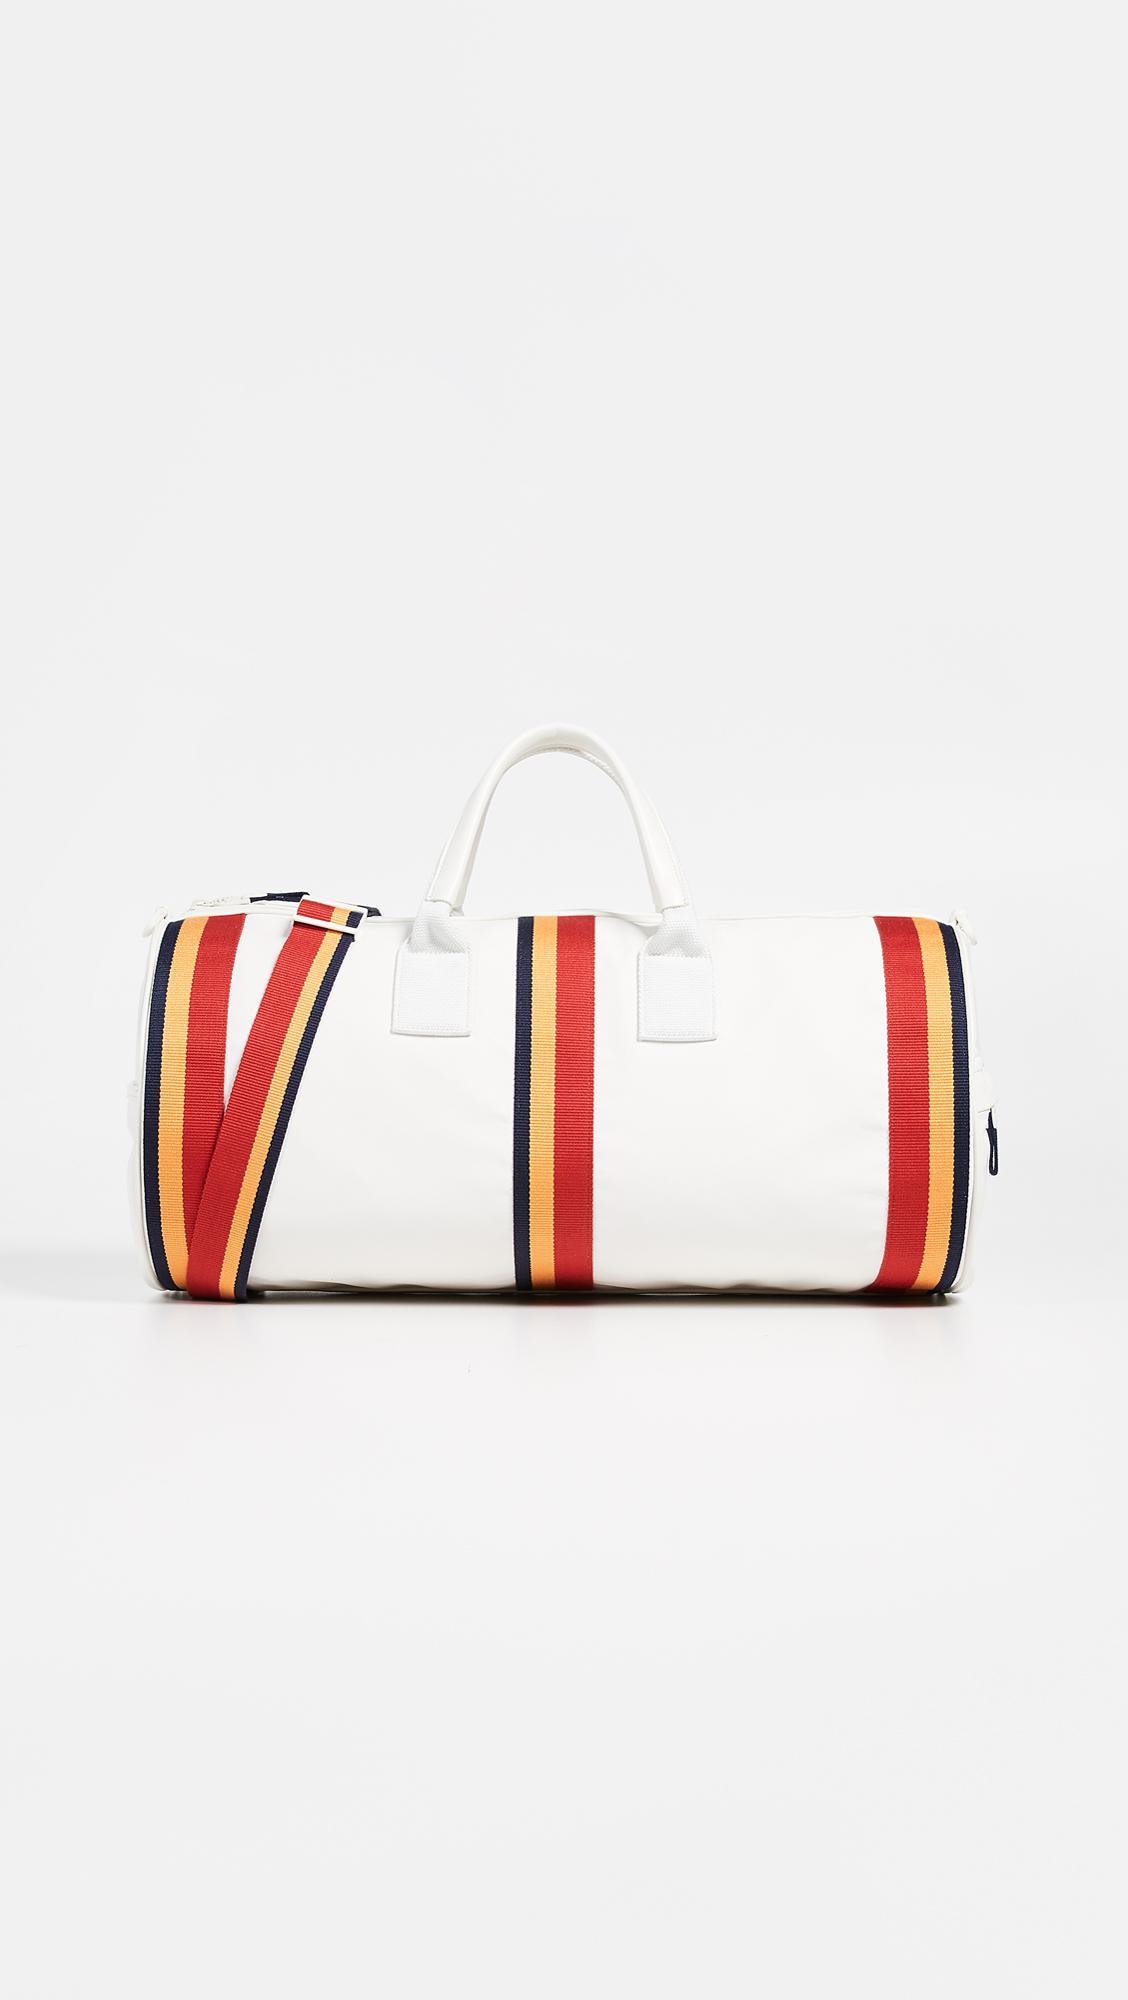 3dcf7503147 Tory Sport Retro Striped Weekender Duffel Bag in White - Lyst